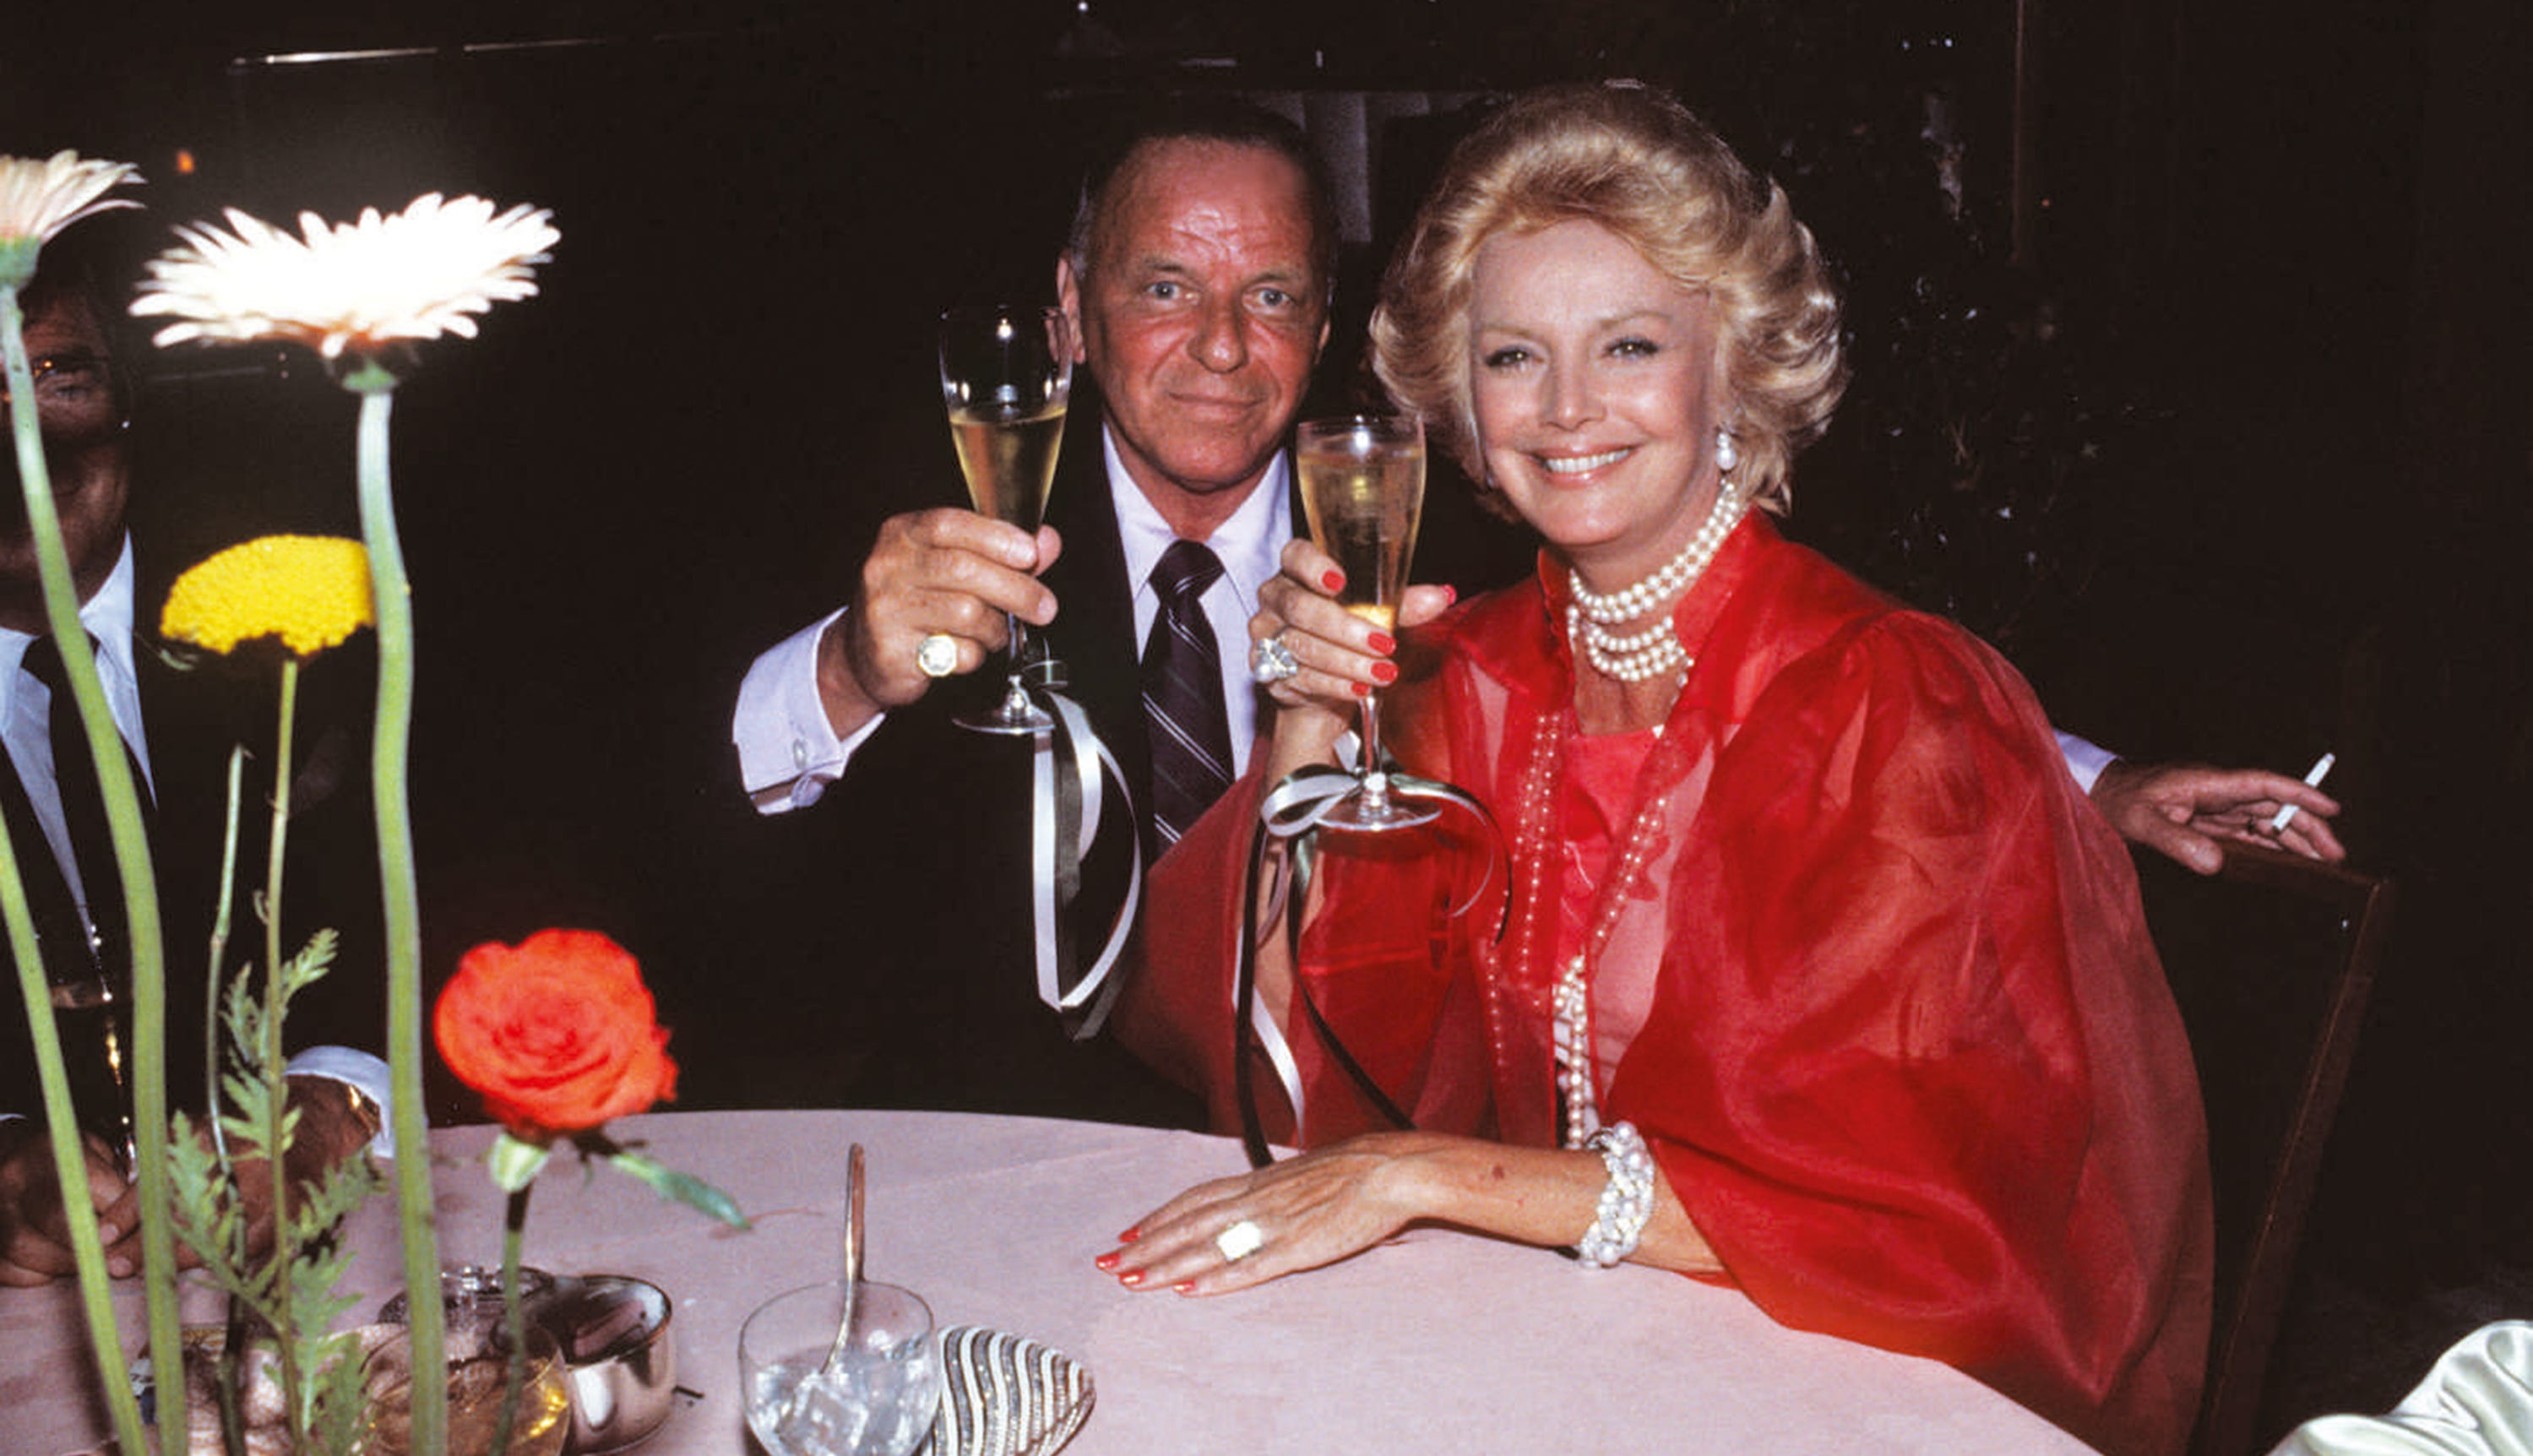 Sinatra jewelry, memorabilia and fine art worth millions to go on auction block